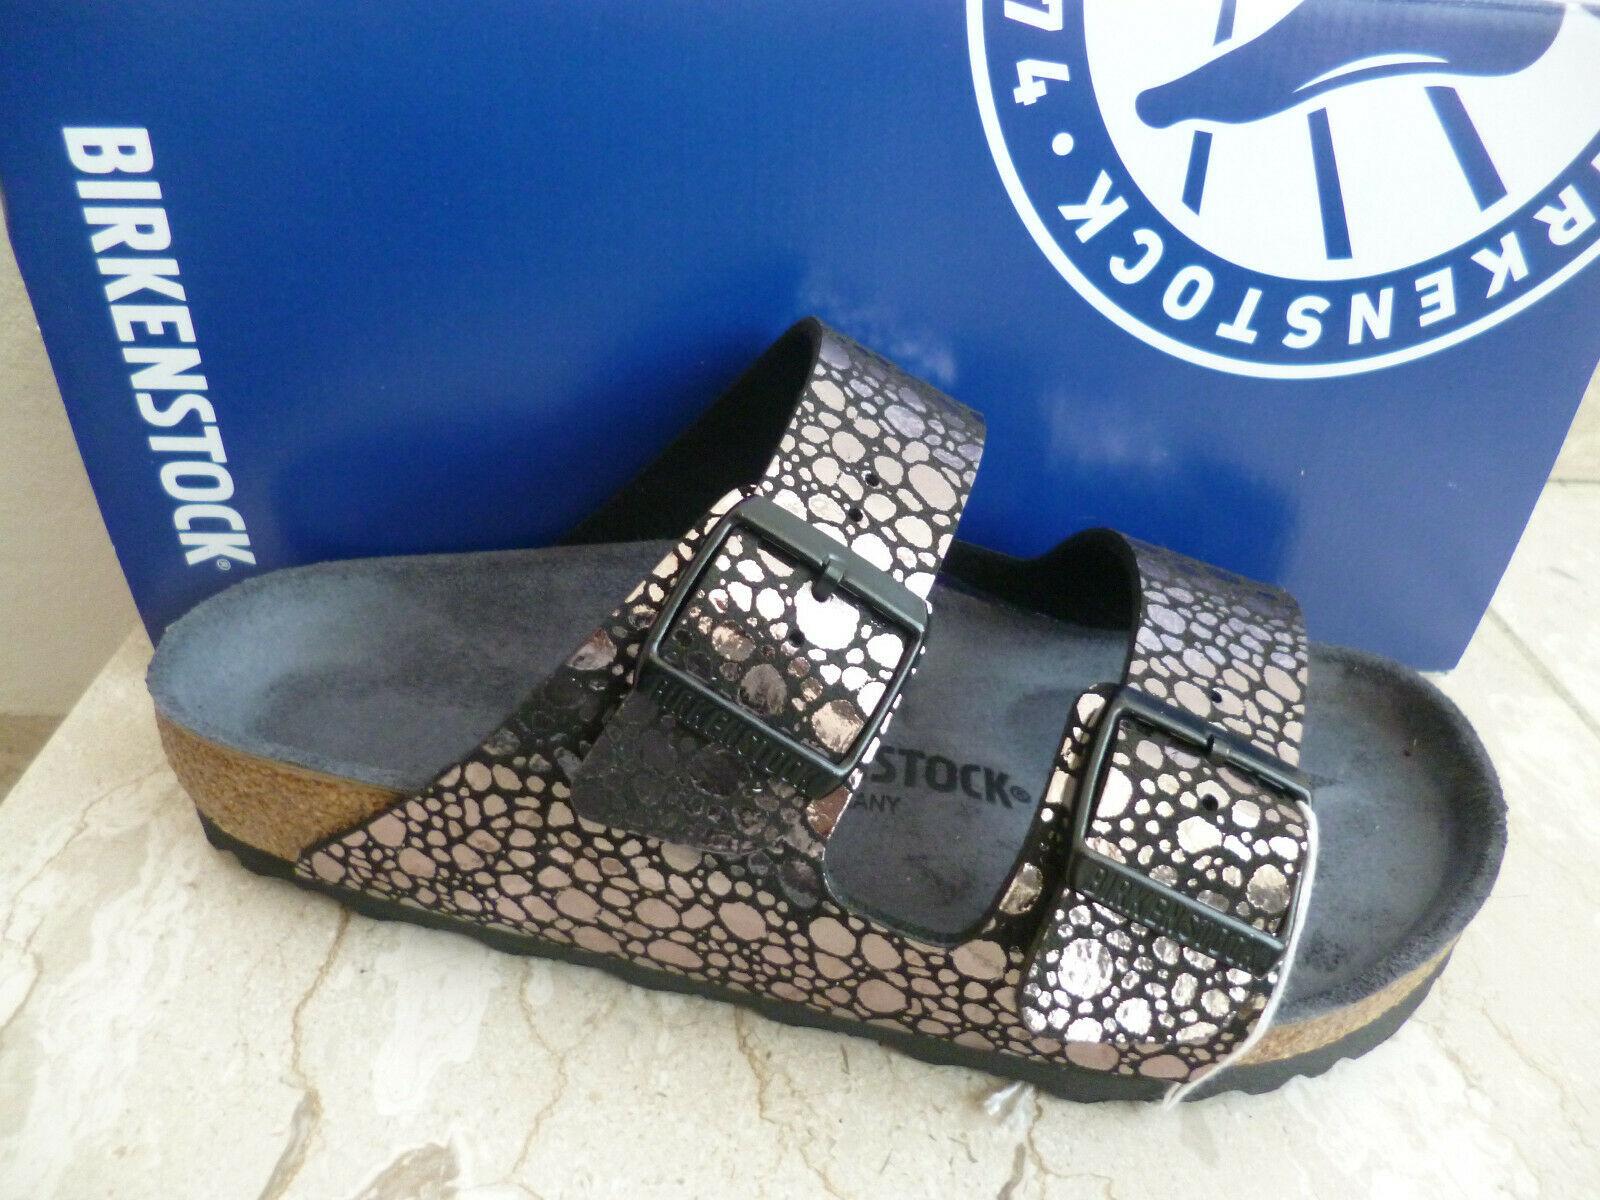 Birkenstock Arizona Pantolette Sandale Metallic Stones Black 1008871 NEU!